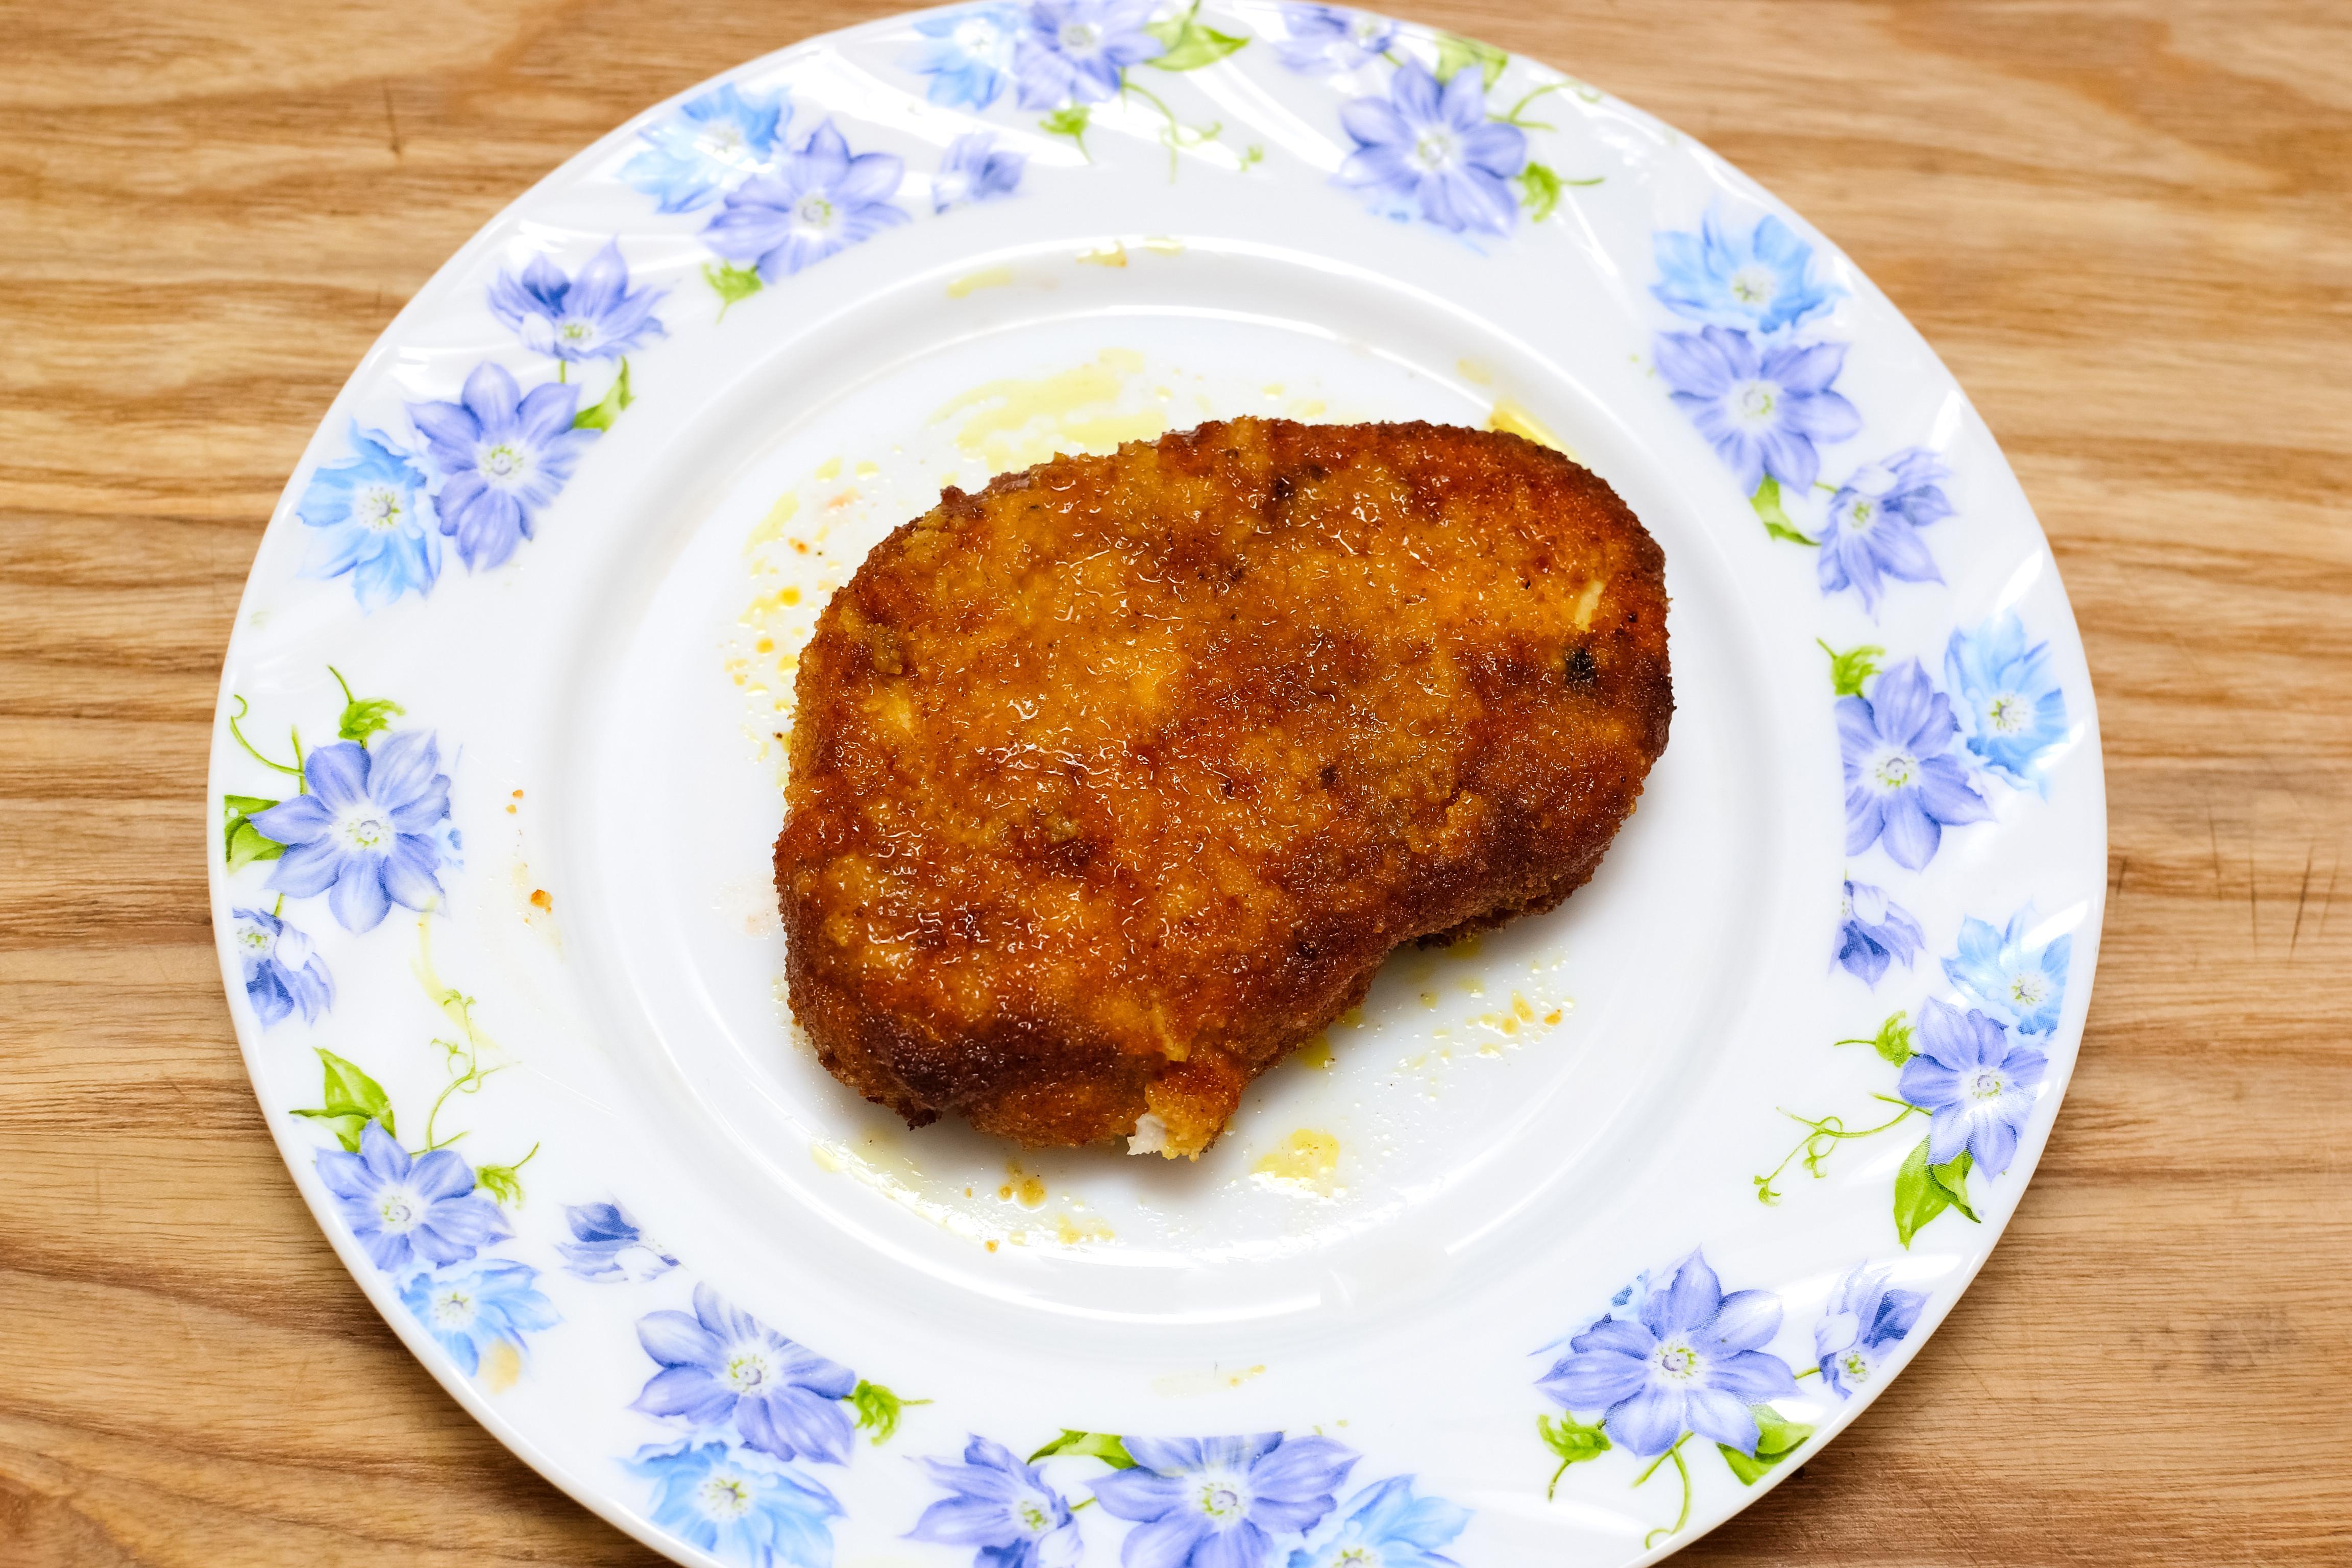 Bake Boneless Pork Chops  4 Ways to Cook Boneless Pork Chops wikiHow